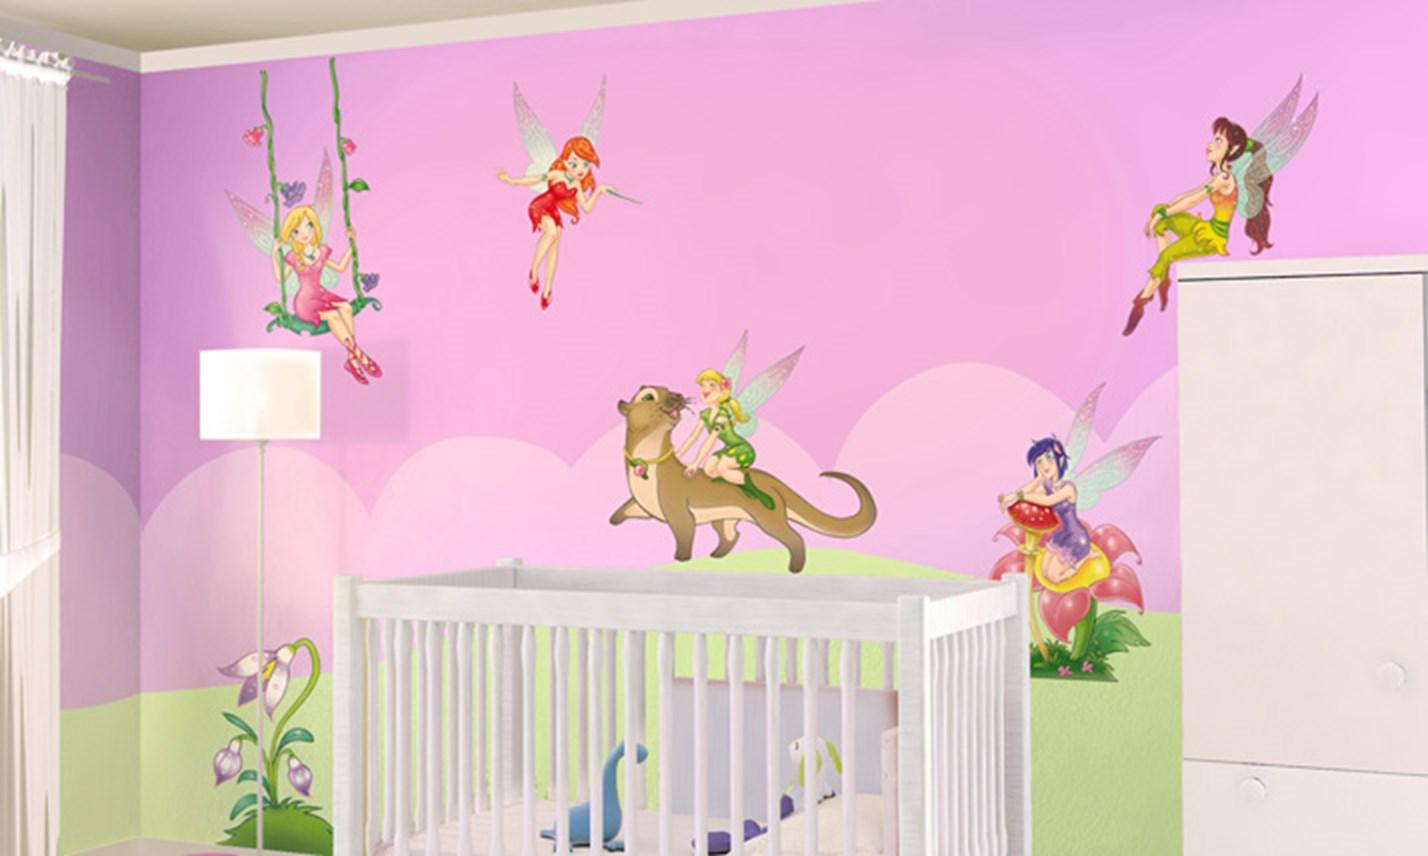 sticker chambre parentale excellent sticker tte de lit rve moderne with sticker chambre. Black Bedroom Furniture Sets. Home Design Ideas